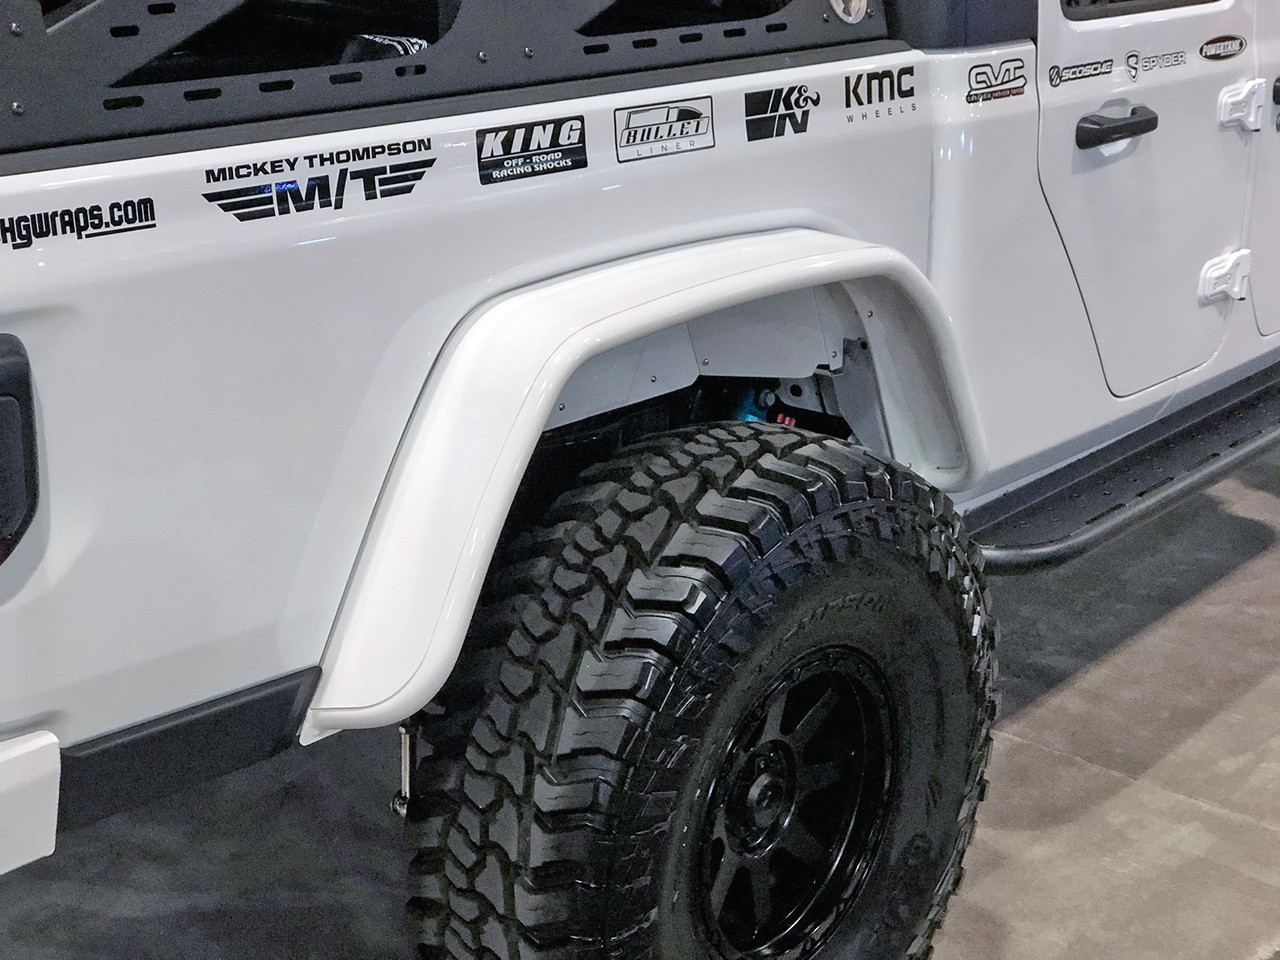 Jeep Gladiator (JT) Rear Tube Fenders powder coated white